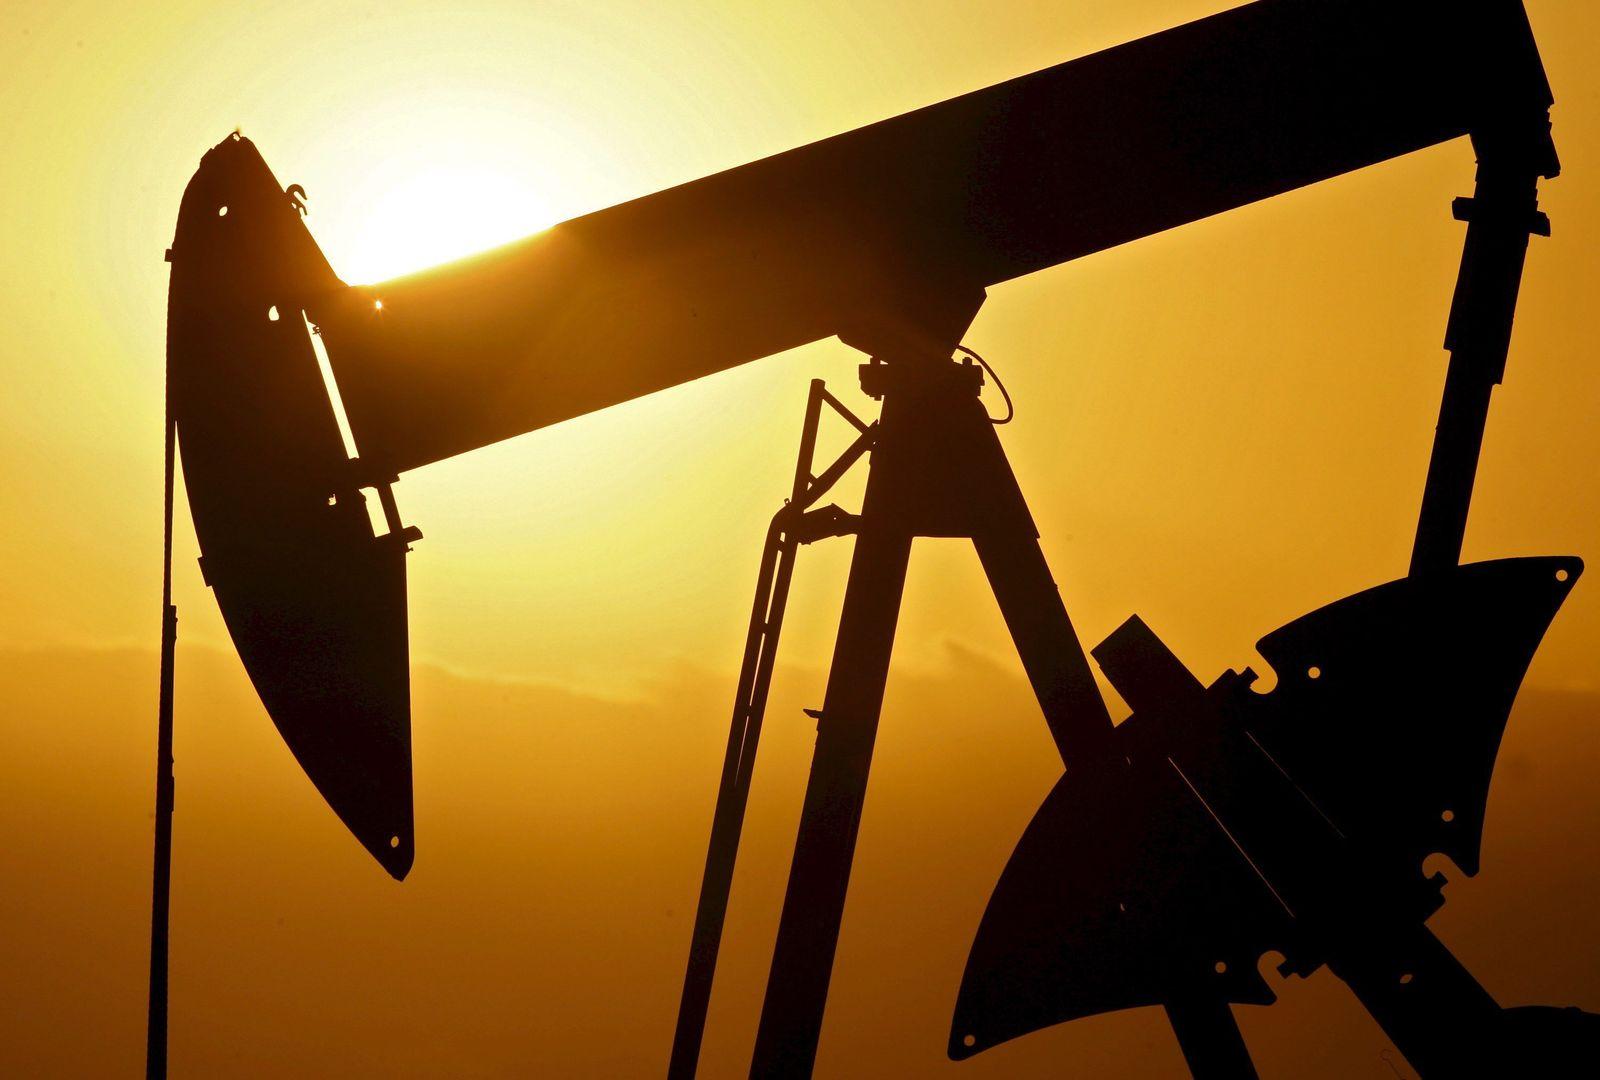 Erdölförderung / Oklahoma / Erdbeben